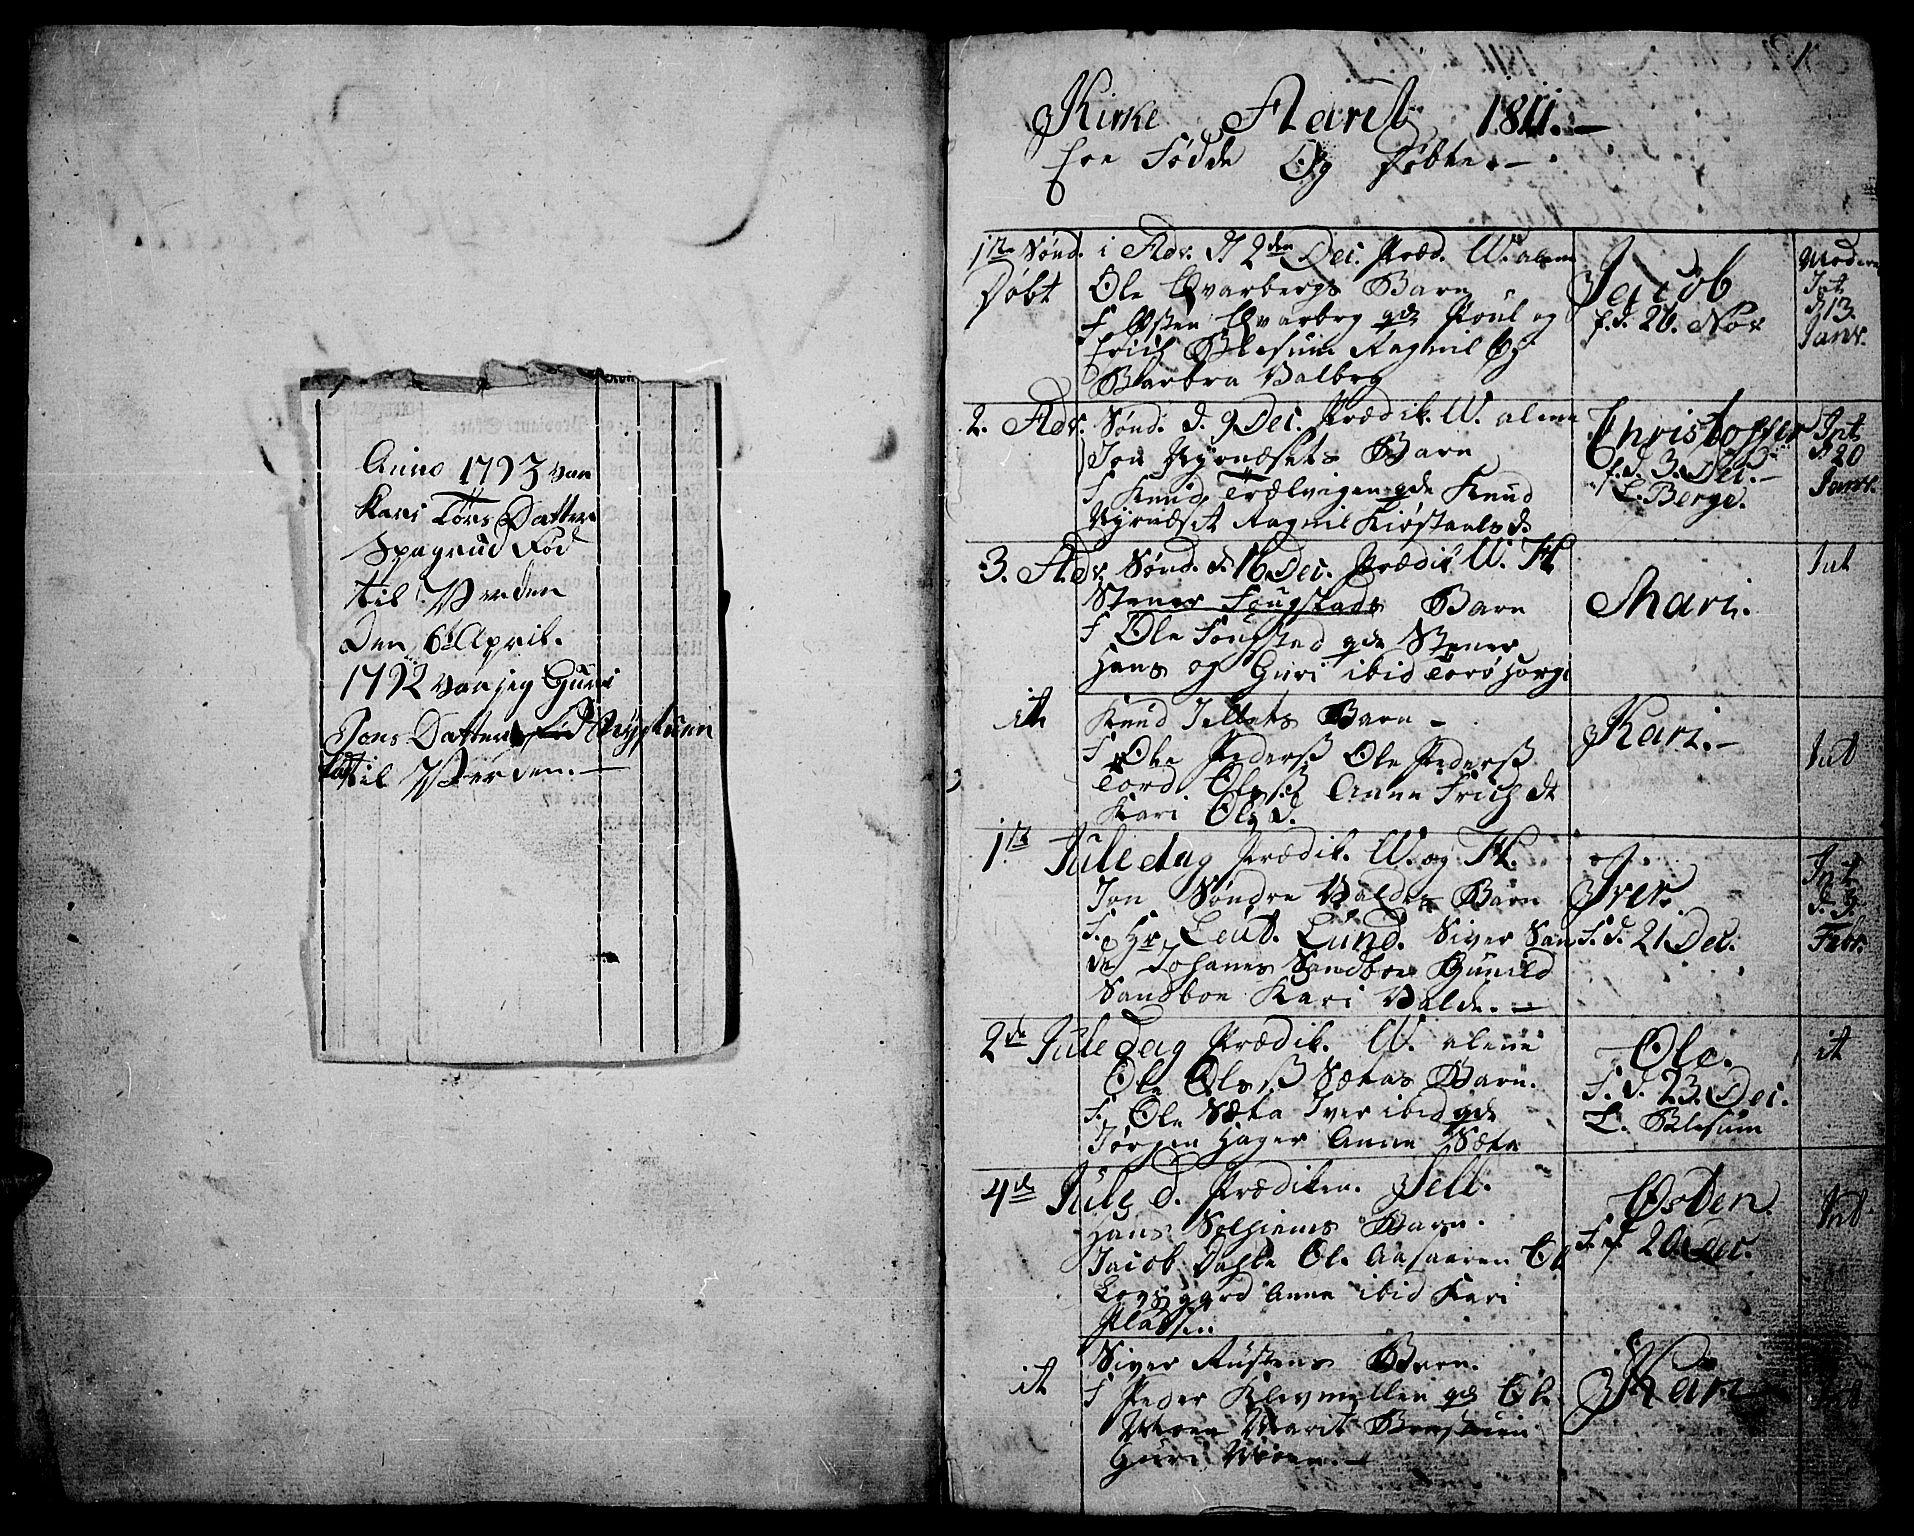 SAH, Vågå prestekontor, Ministerialbok nr. 2, 1810-1815, s. 0-1